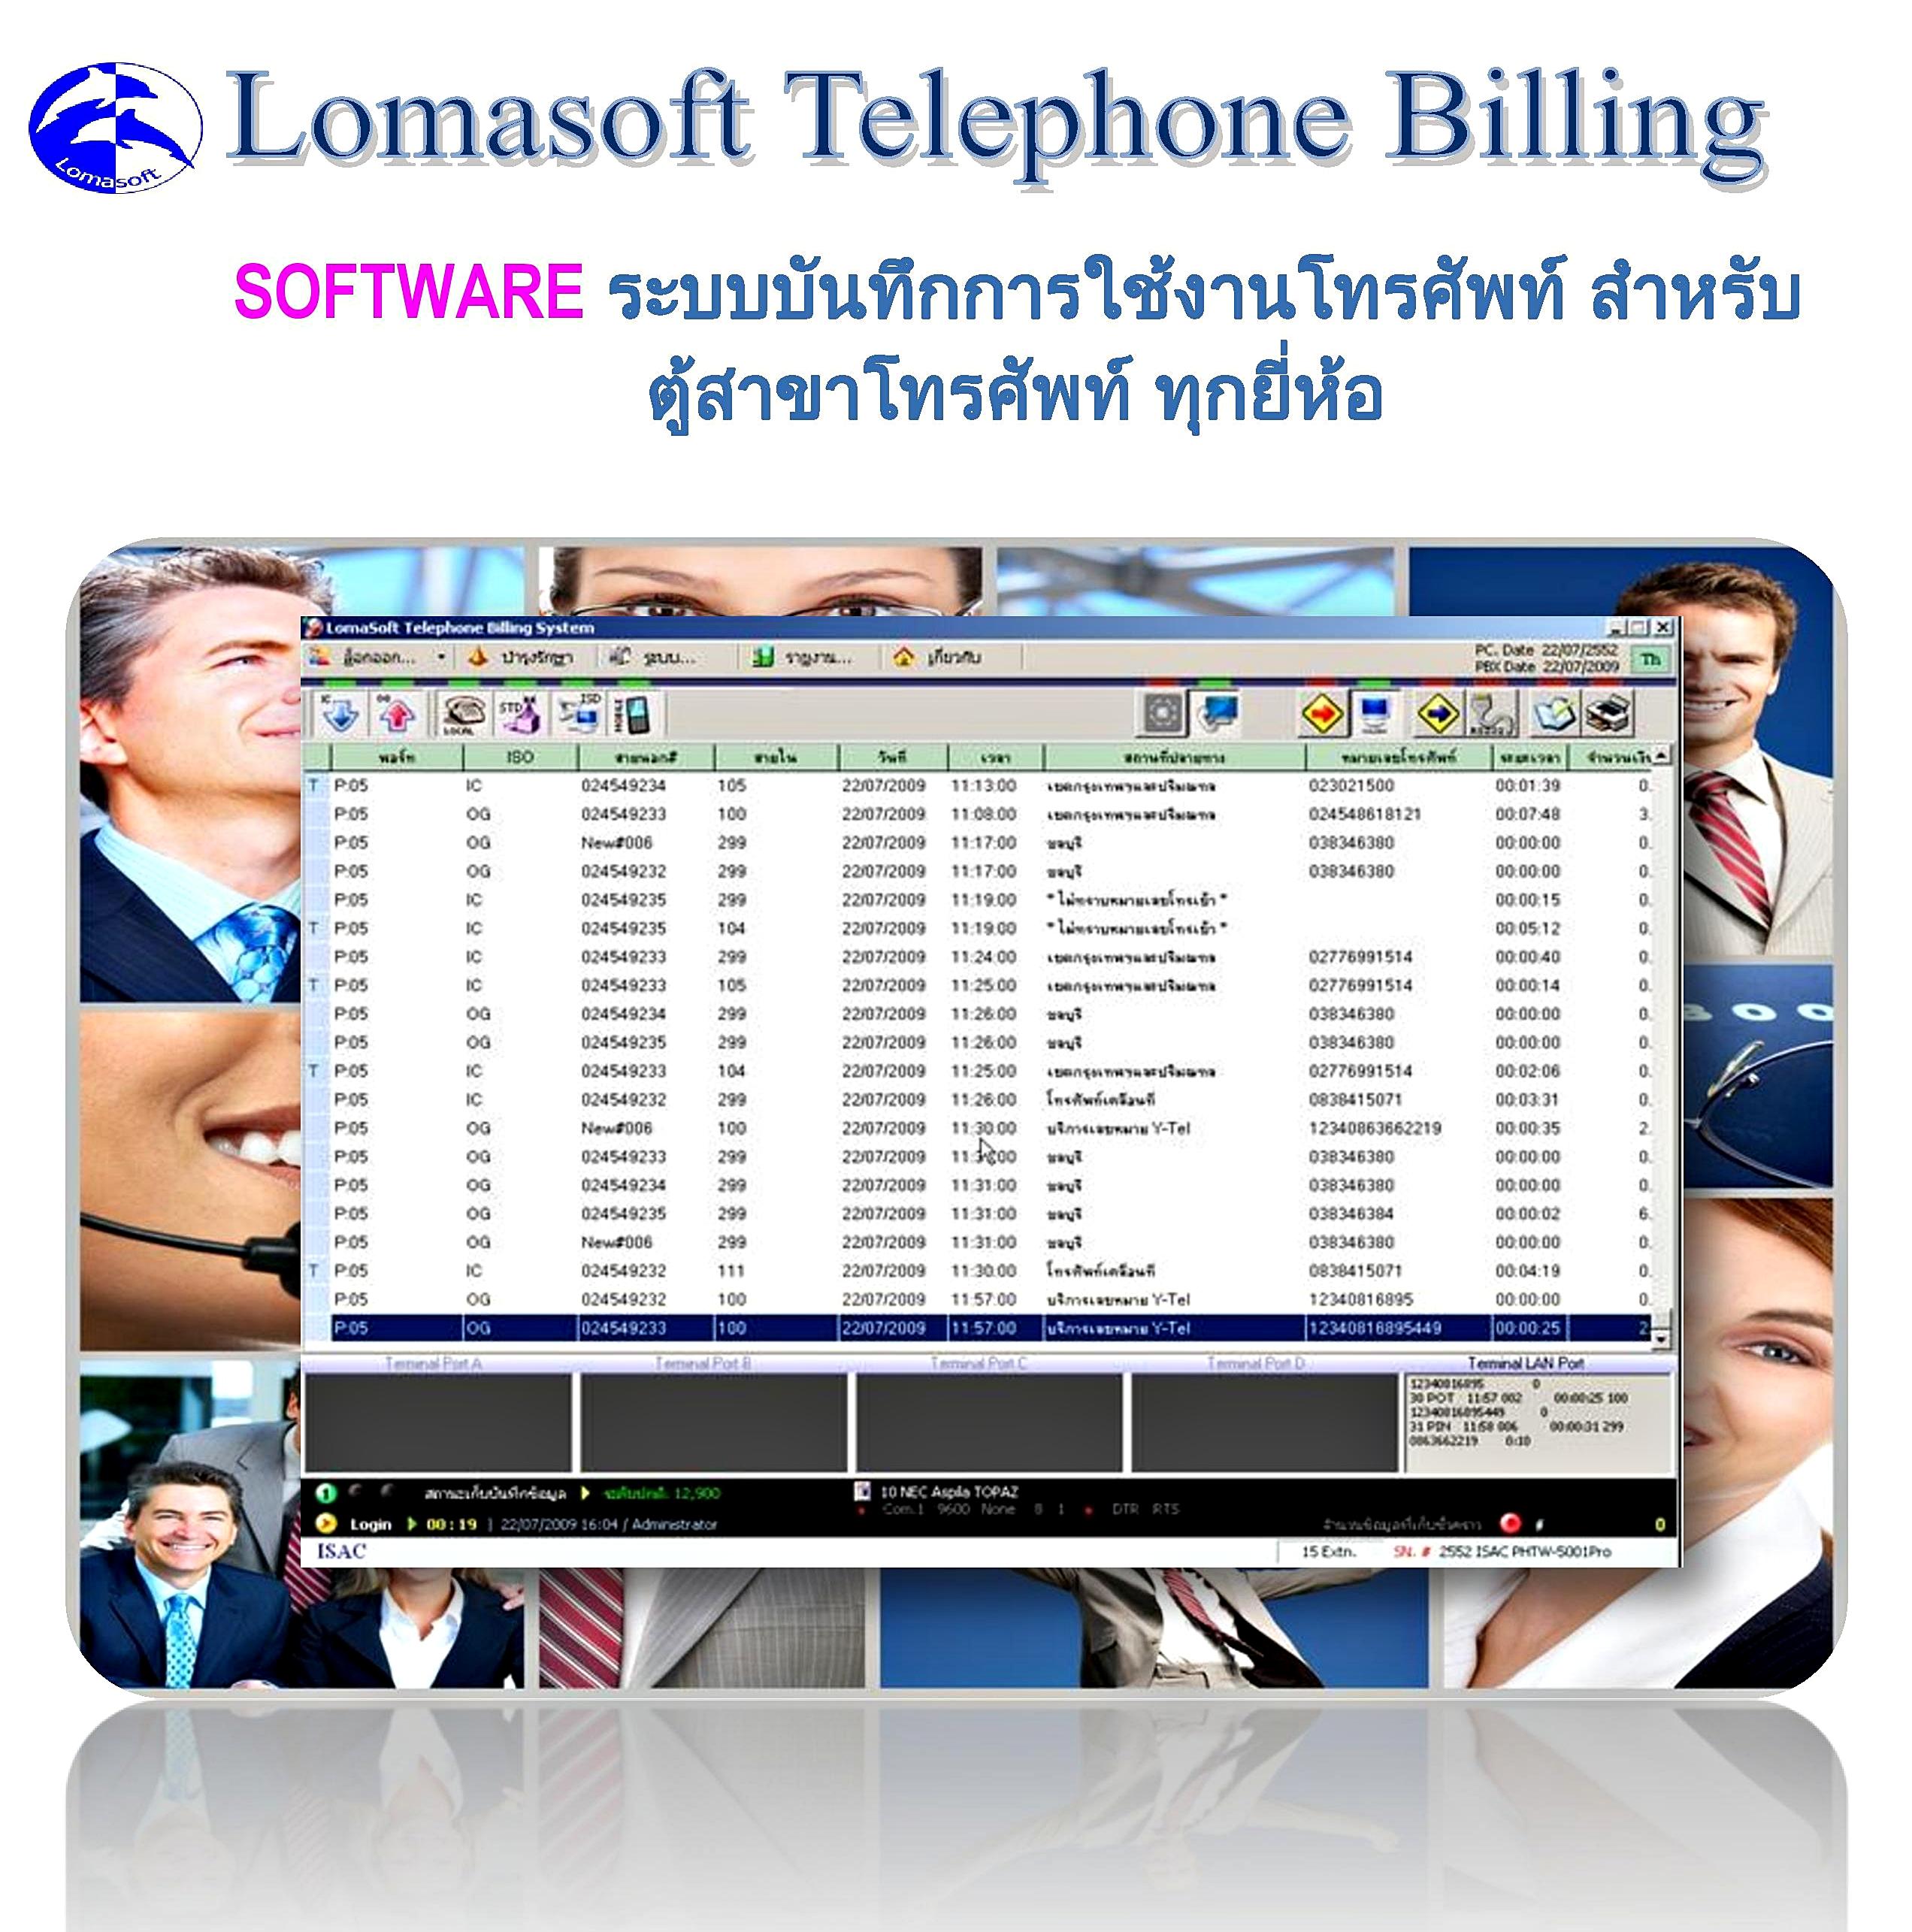 Lomasoft Telephone Billing System - 512 Ext